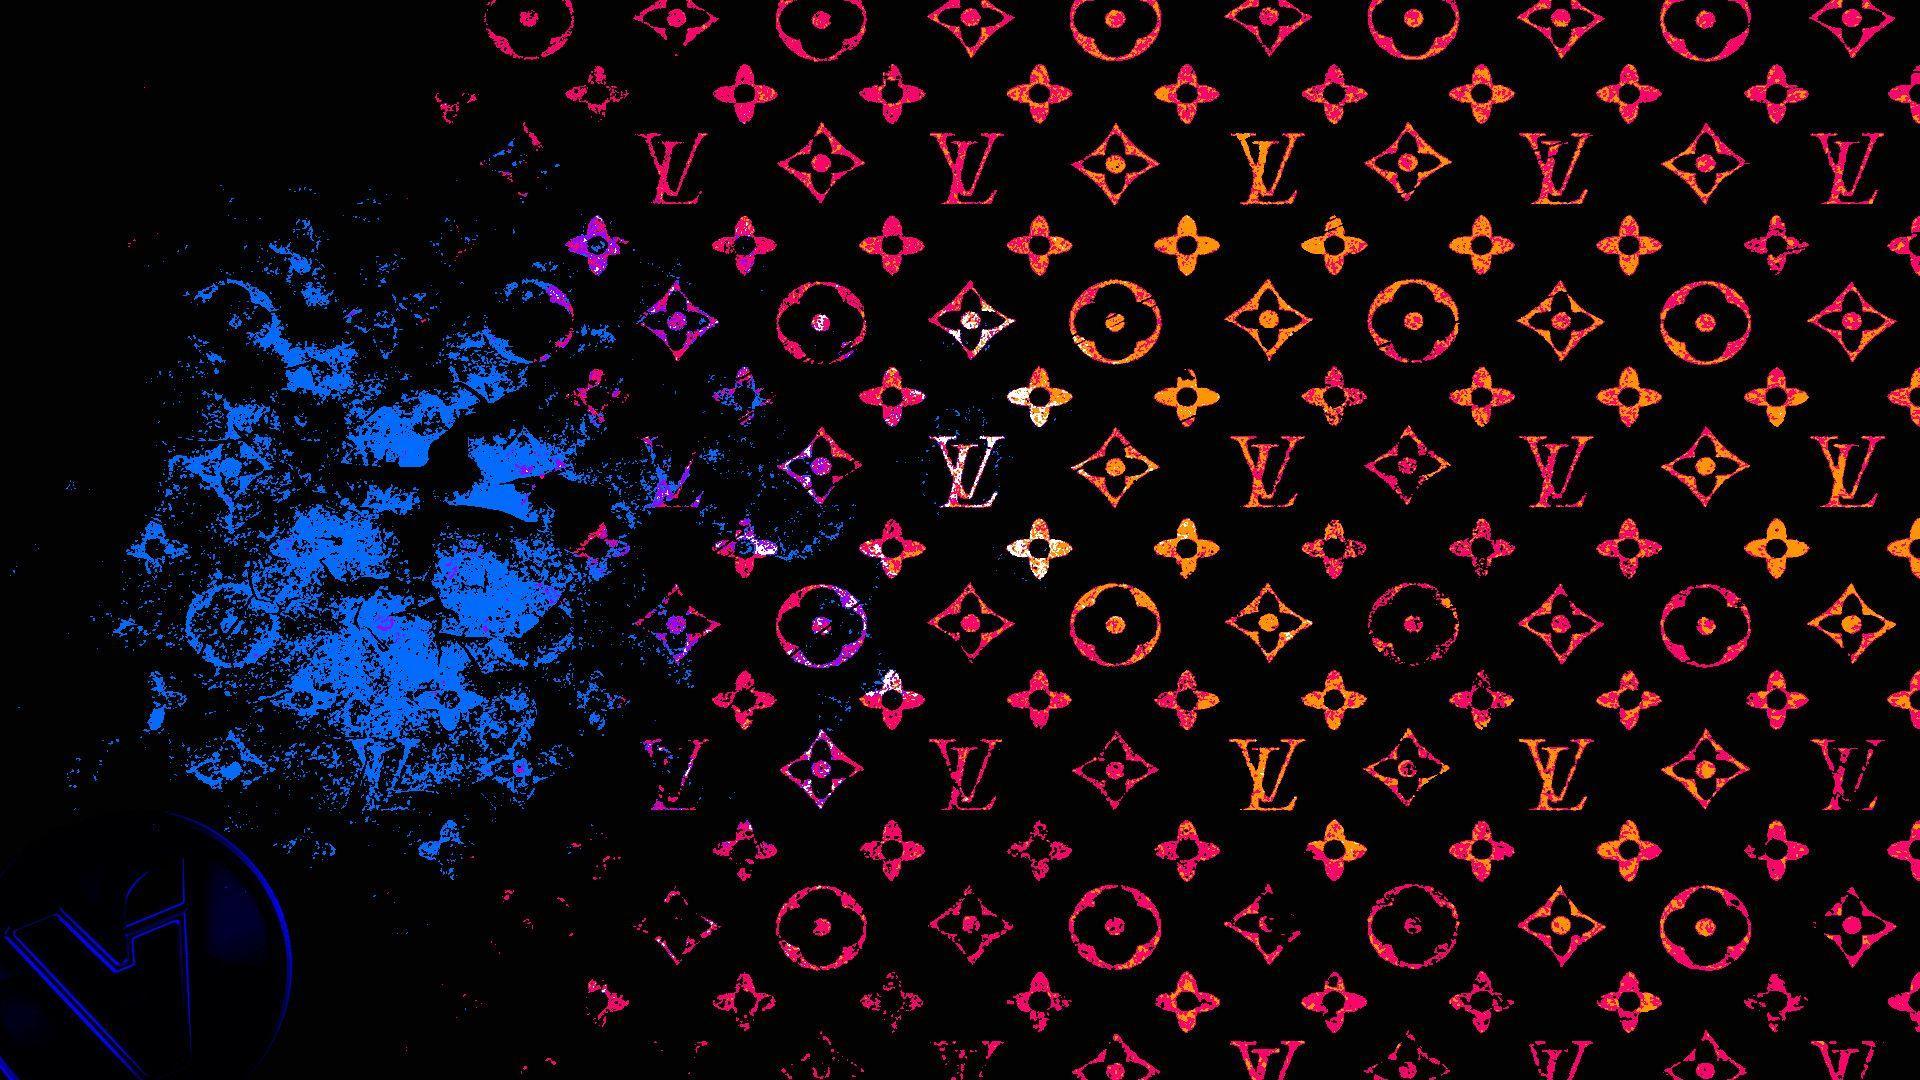 Versace Hd Wallpapers Wallpaper Cave